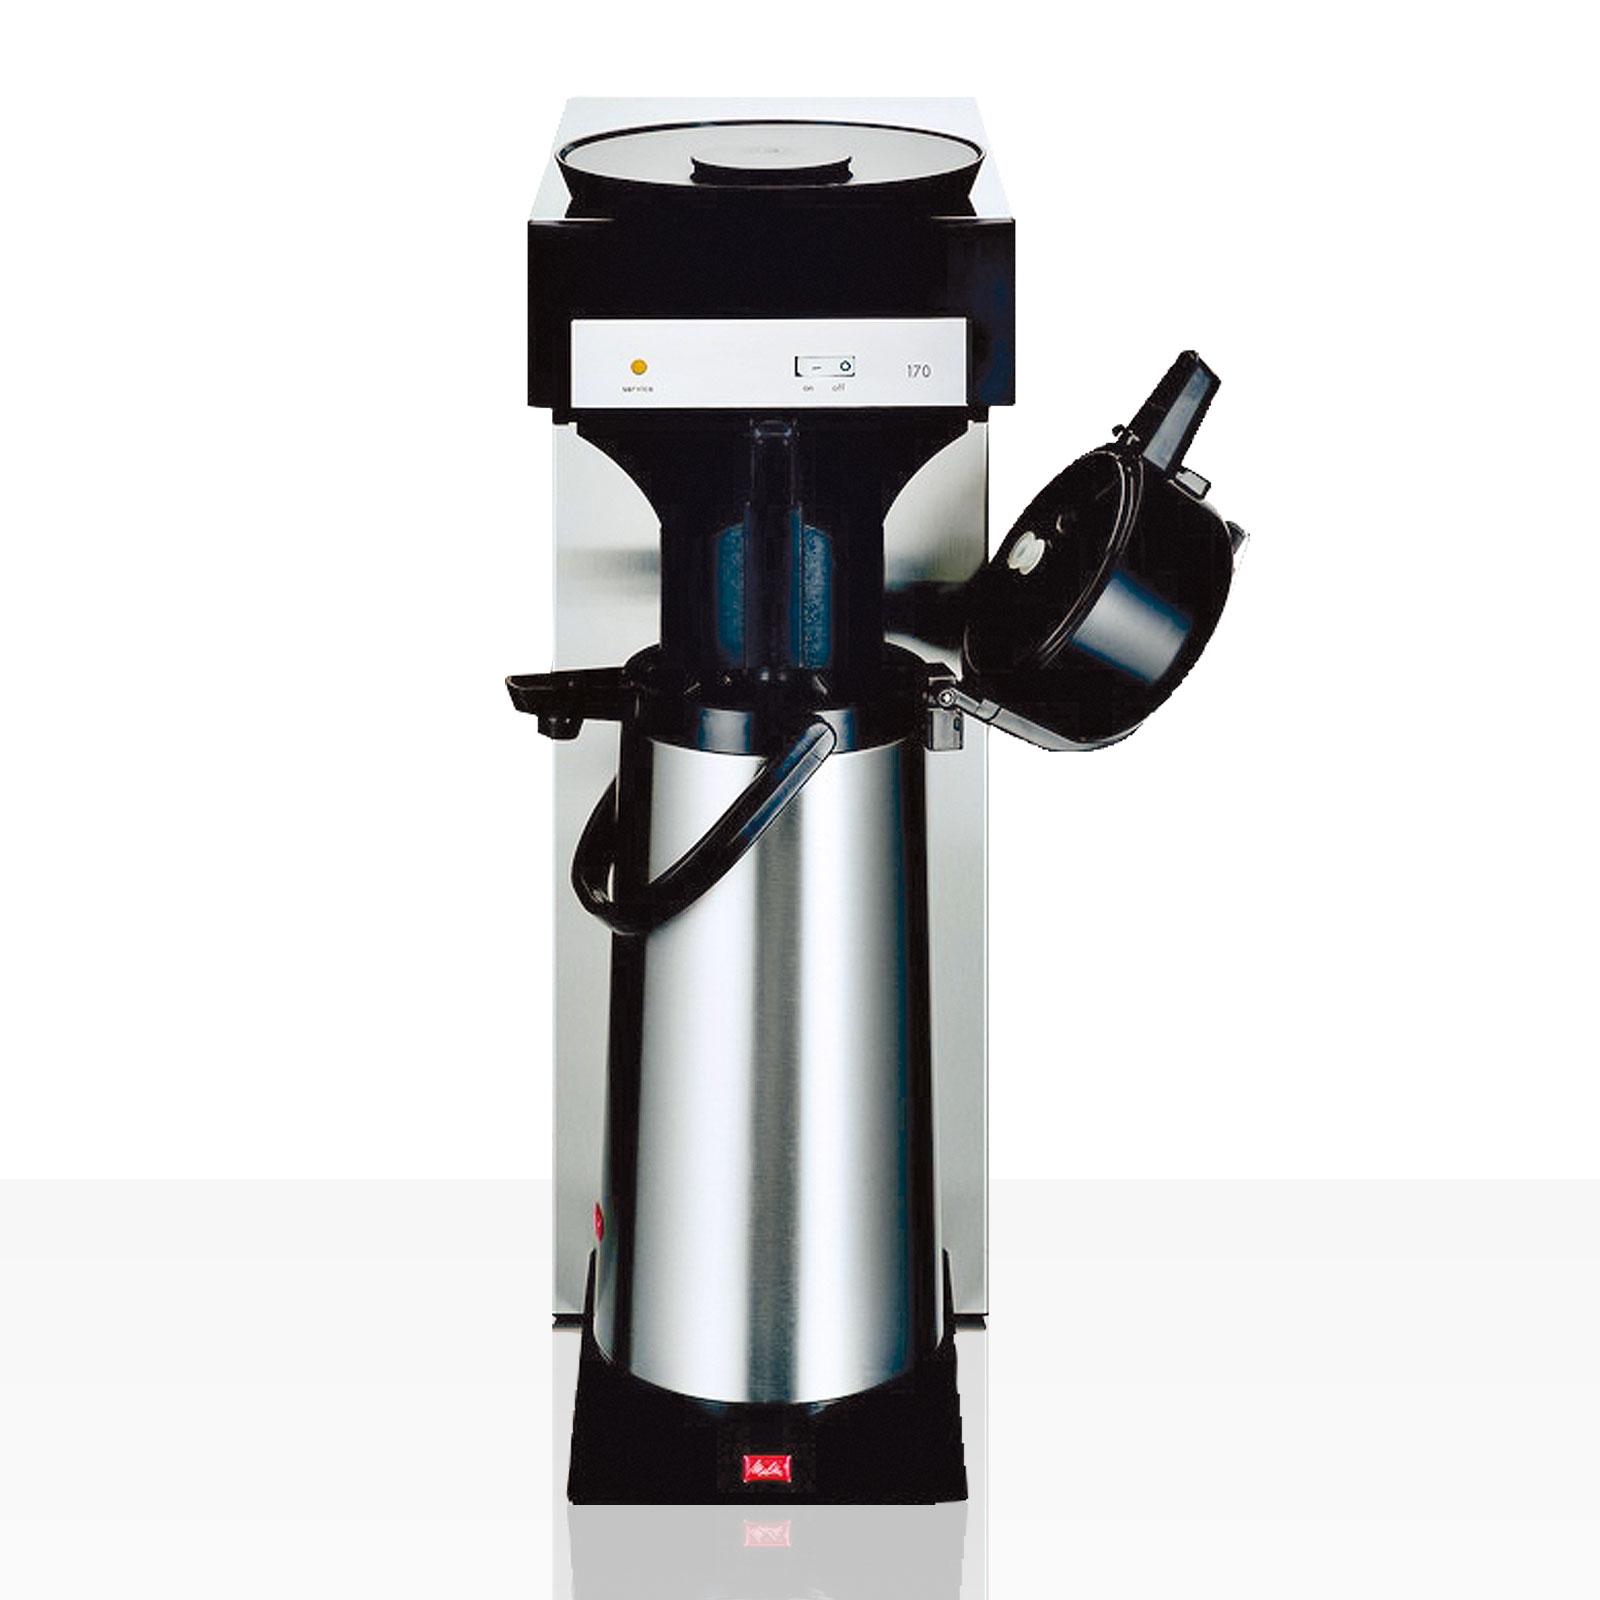 Melitta M 170 MT Gastro Filter-Kaffeemaschine inkl. Kanne (Glaskolben) 2,2l